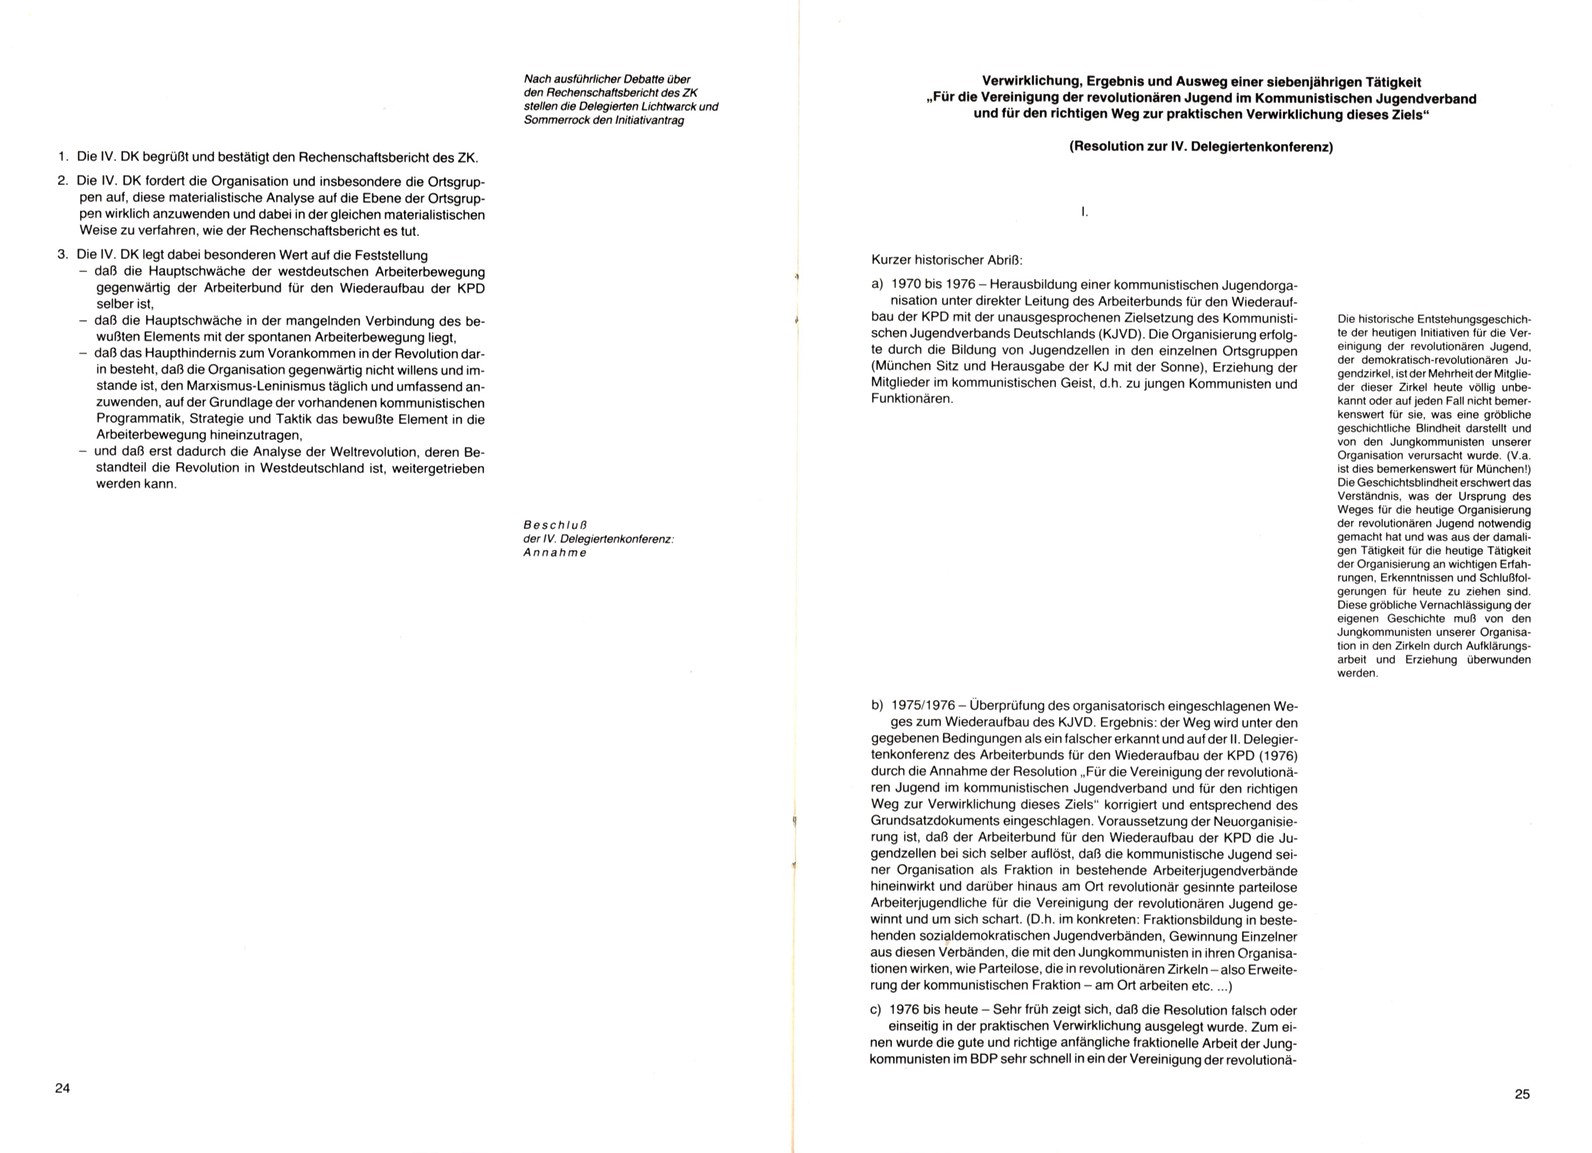 ABG_1985_Beschluesse_IV_Delegiertenkonferenz_14